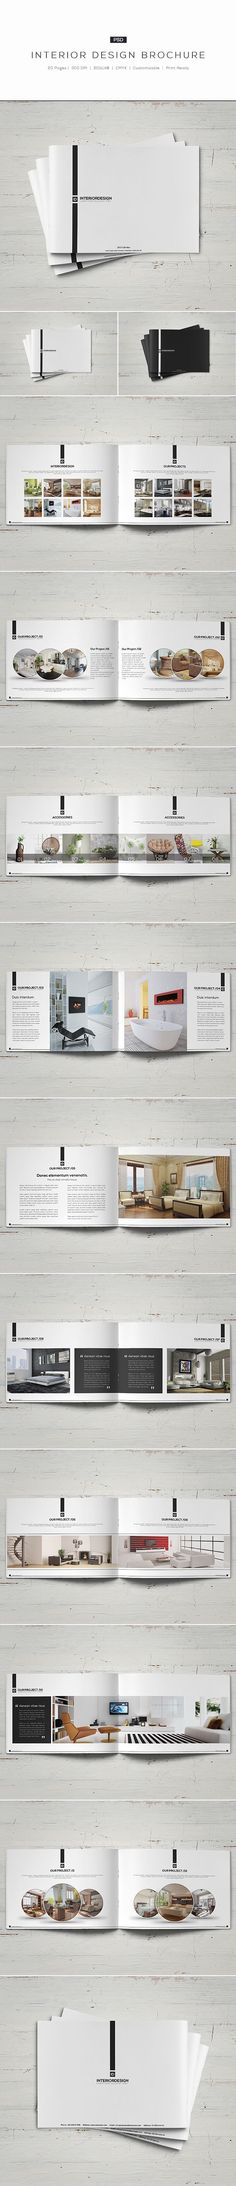 Interior Design Brochure on Behance